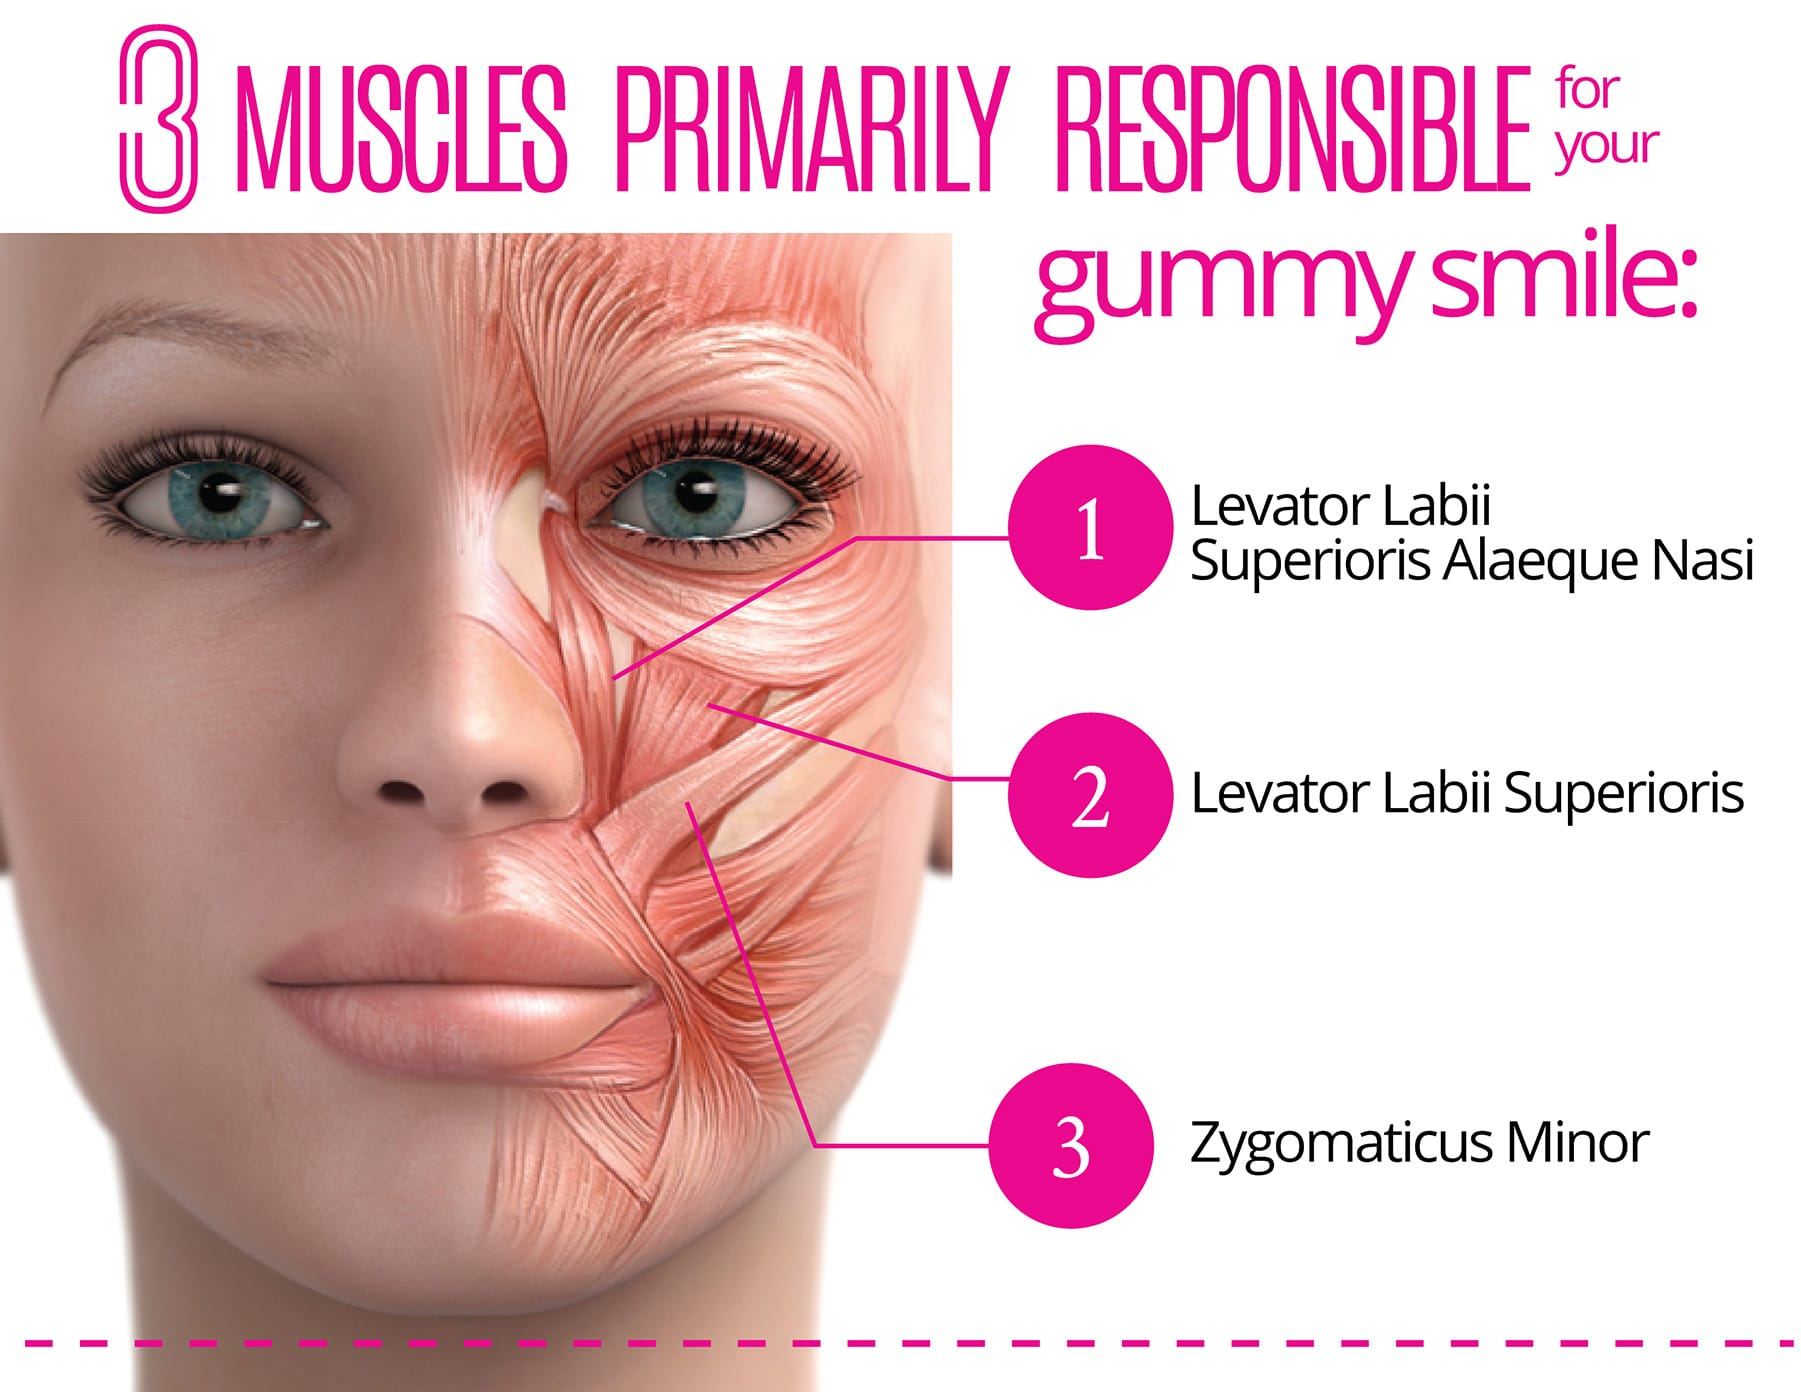 3 muscles primarily responsible for your gummy smile: 1- Levator Labii, 2- Levator Labii Superioris, 3- Zygomaticus Minor